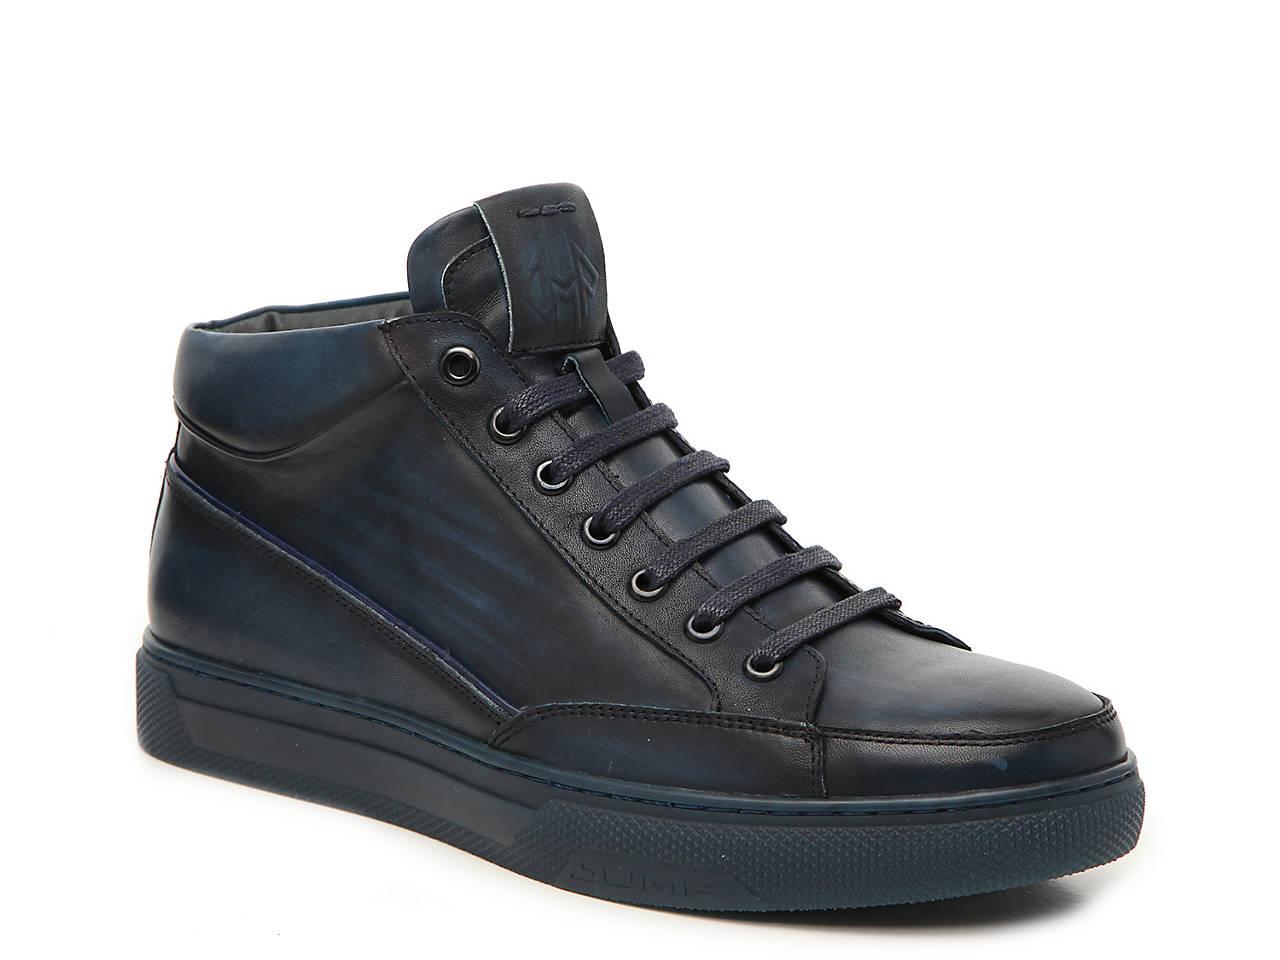 62d557e2e68 Jump Strickland Mid-Top Sneaker Men s Shoes